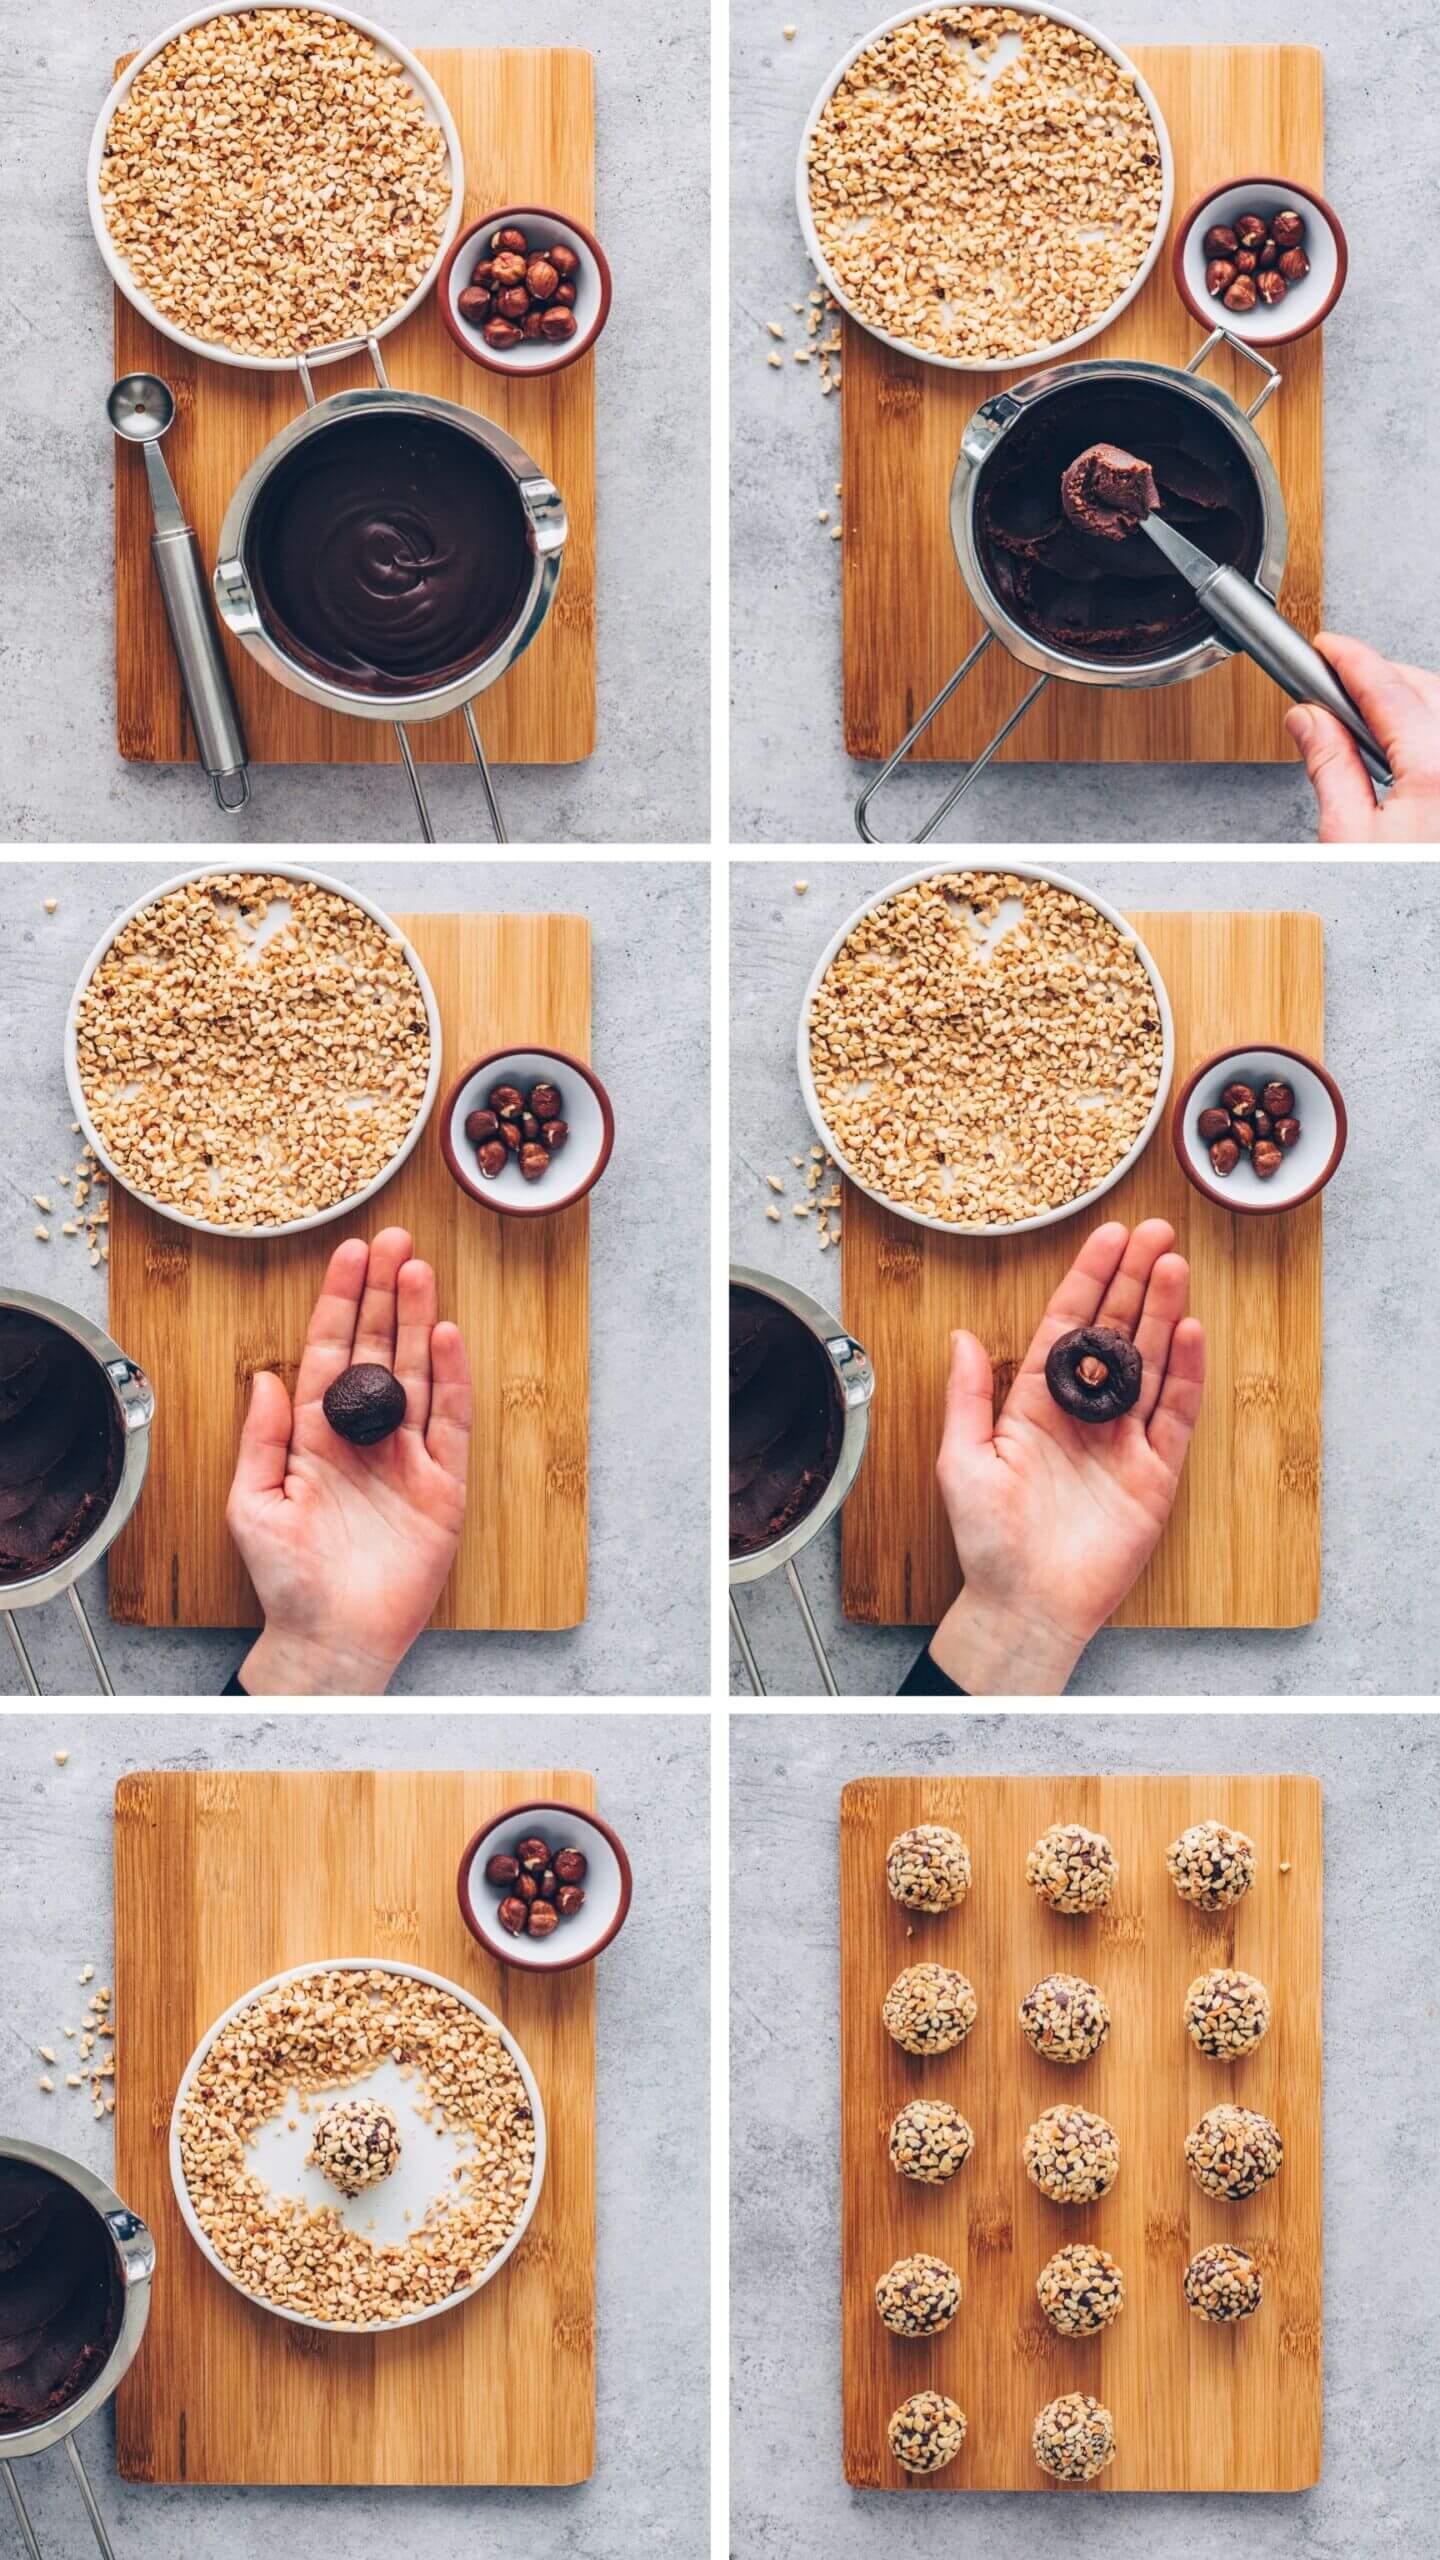 How to make Vegan Ferrero Rocher - step-by-step recipe